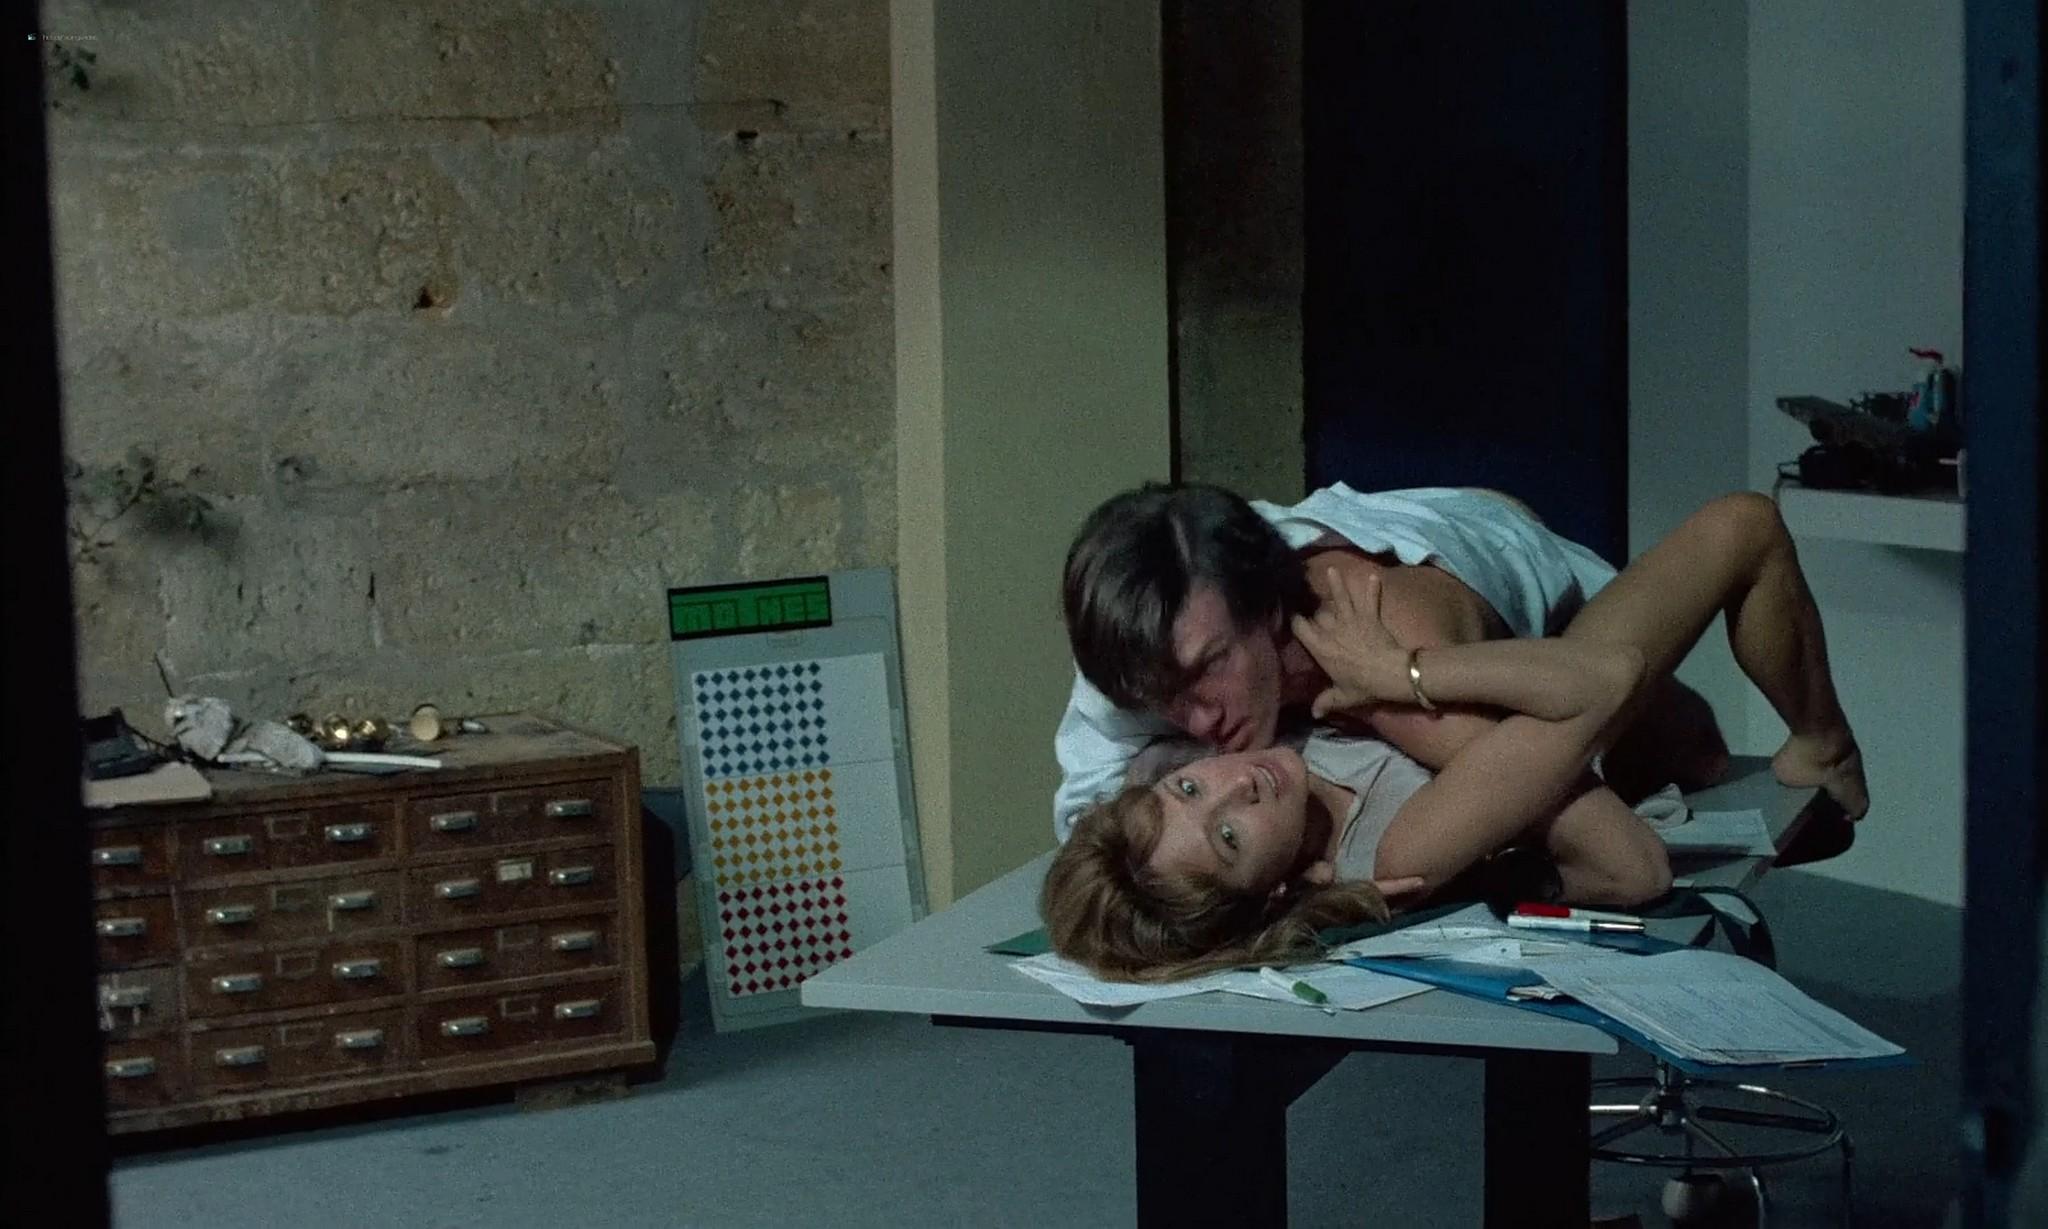 Nathalie Baye nude in the shower En toute innocence FR 1988 1080p BluRay 2